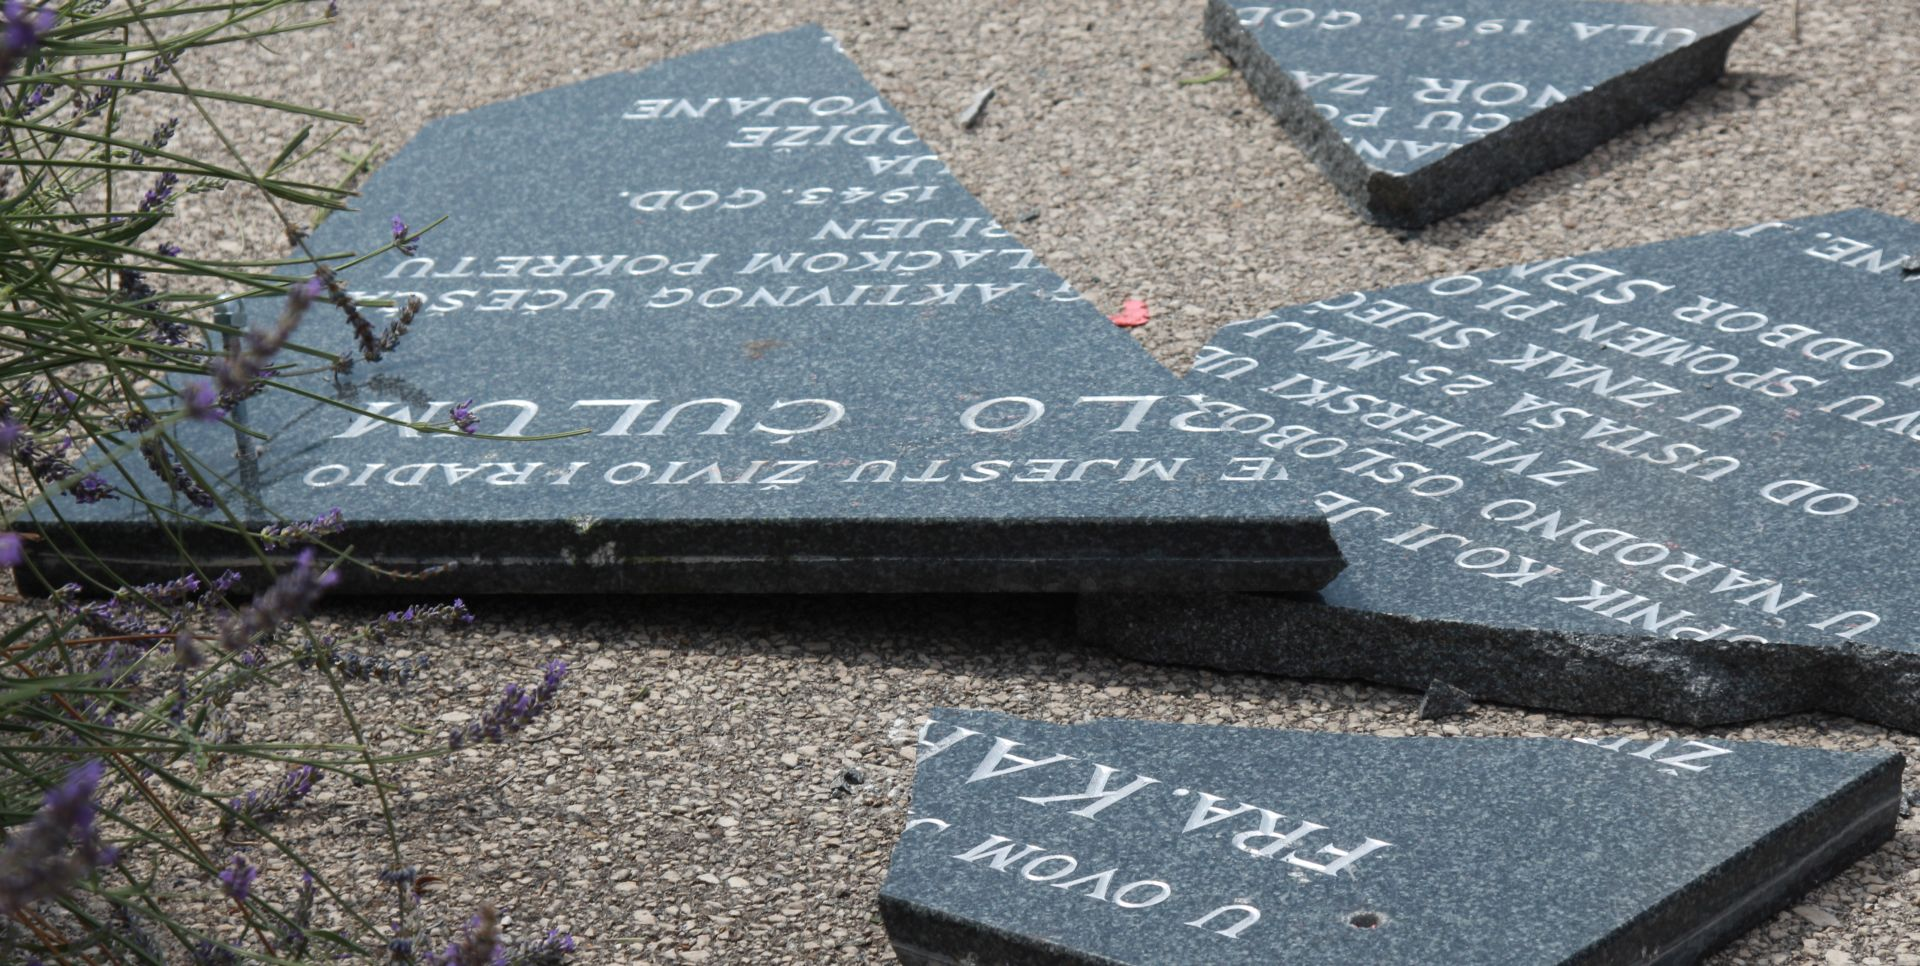 Razbijen spomenik fra Karlu Ćulumu kod Vrgorca